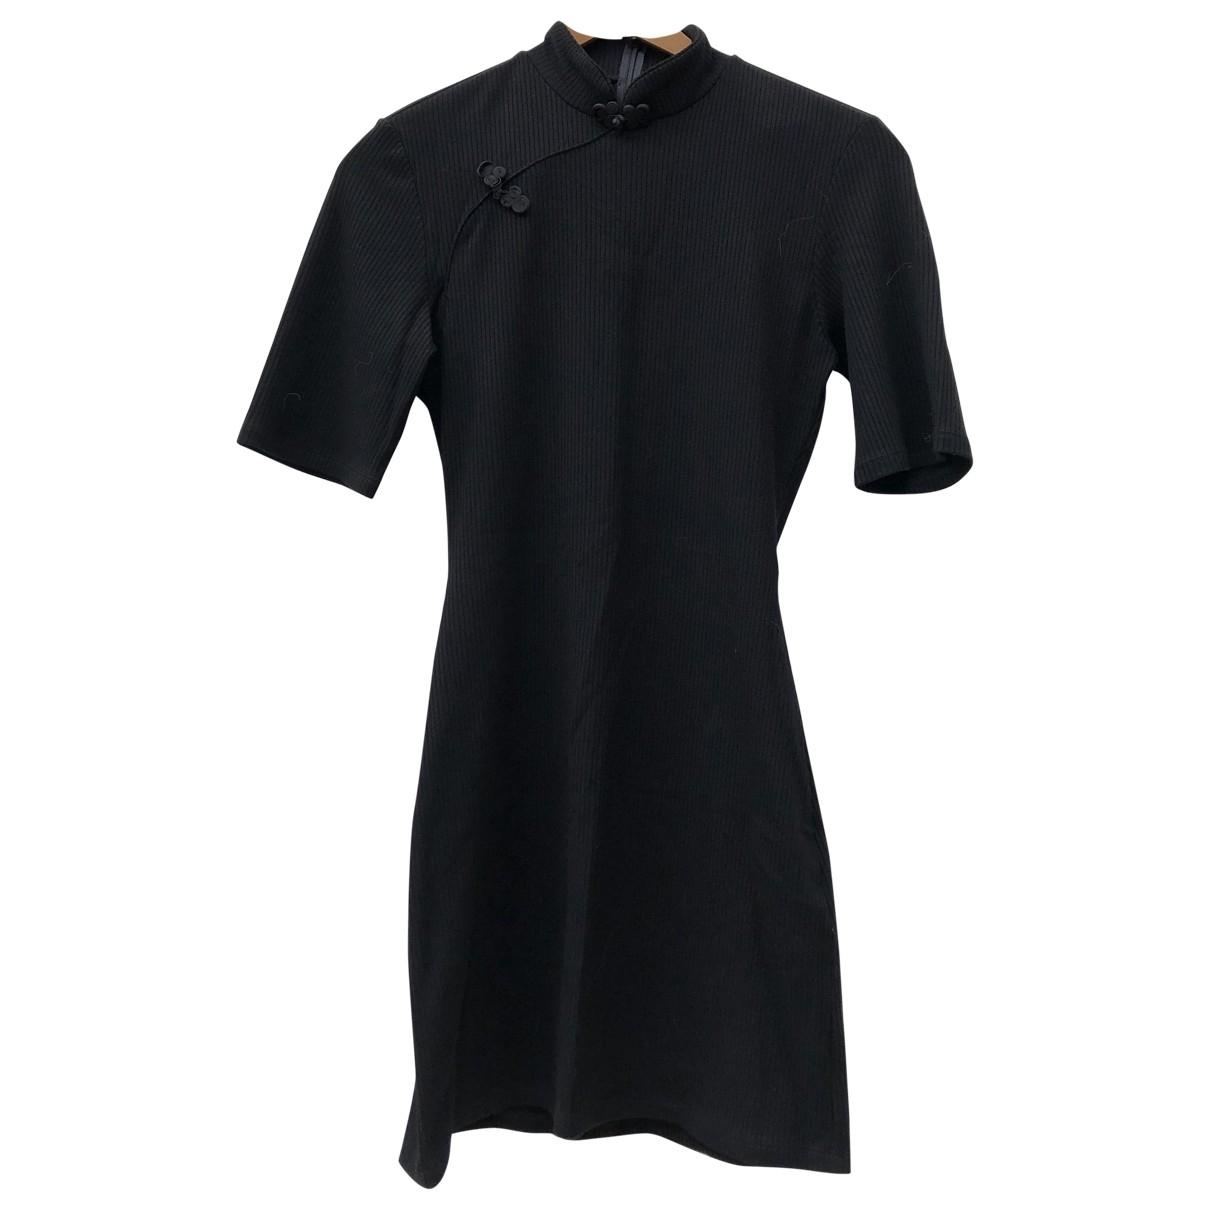 Reformation \N Black dress for Women M International